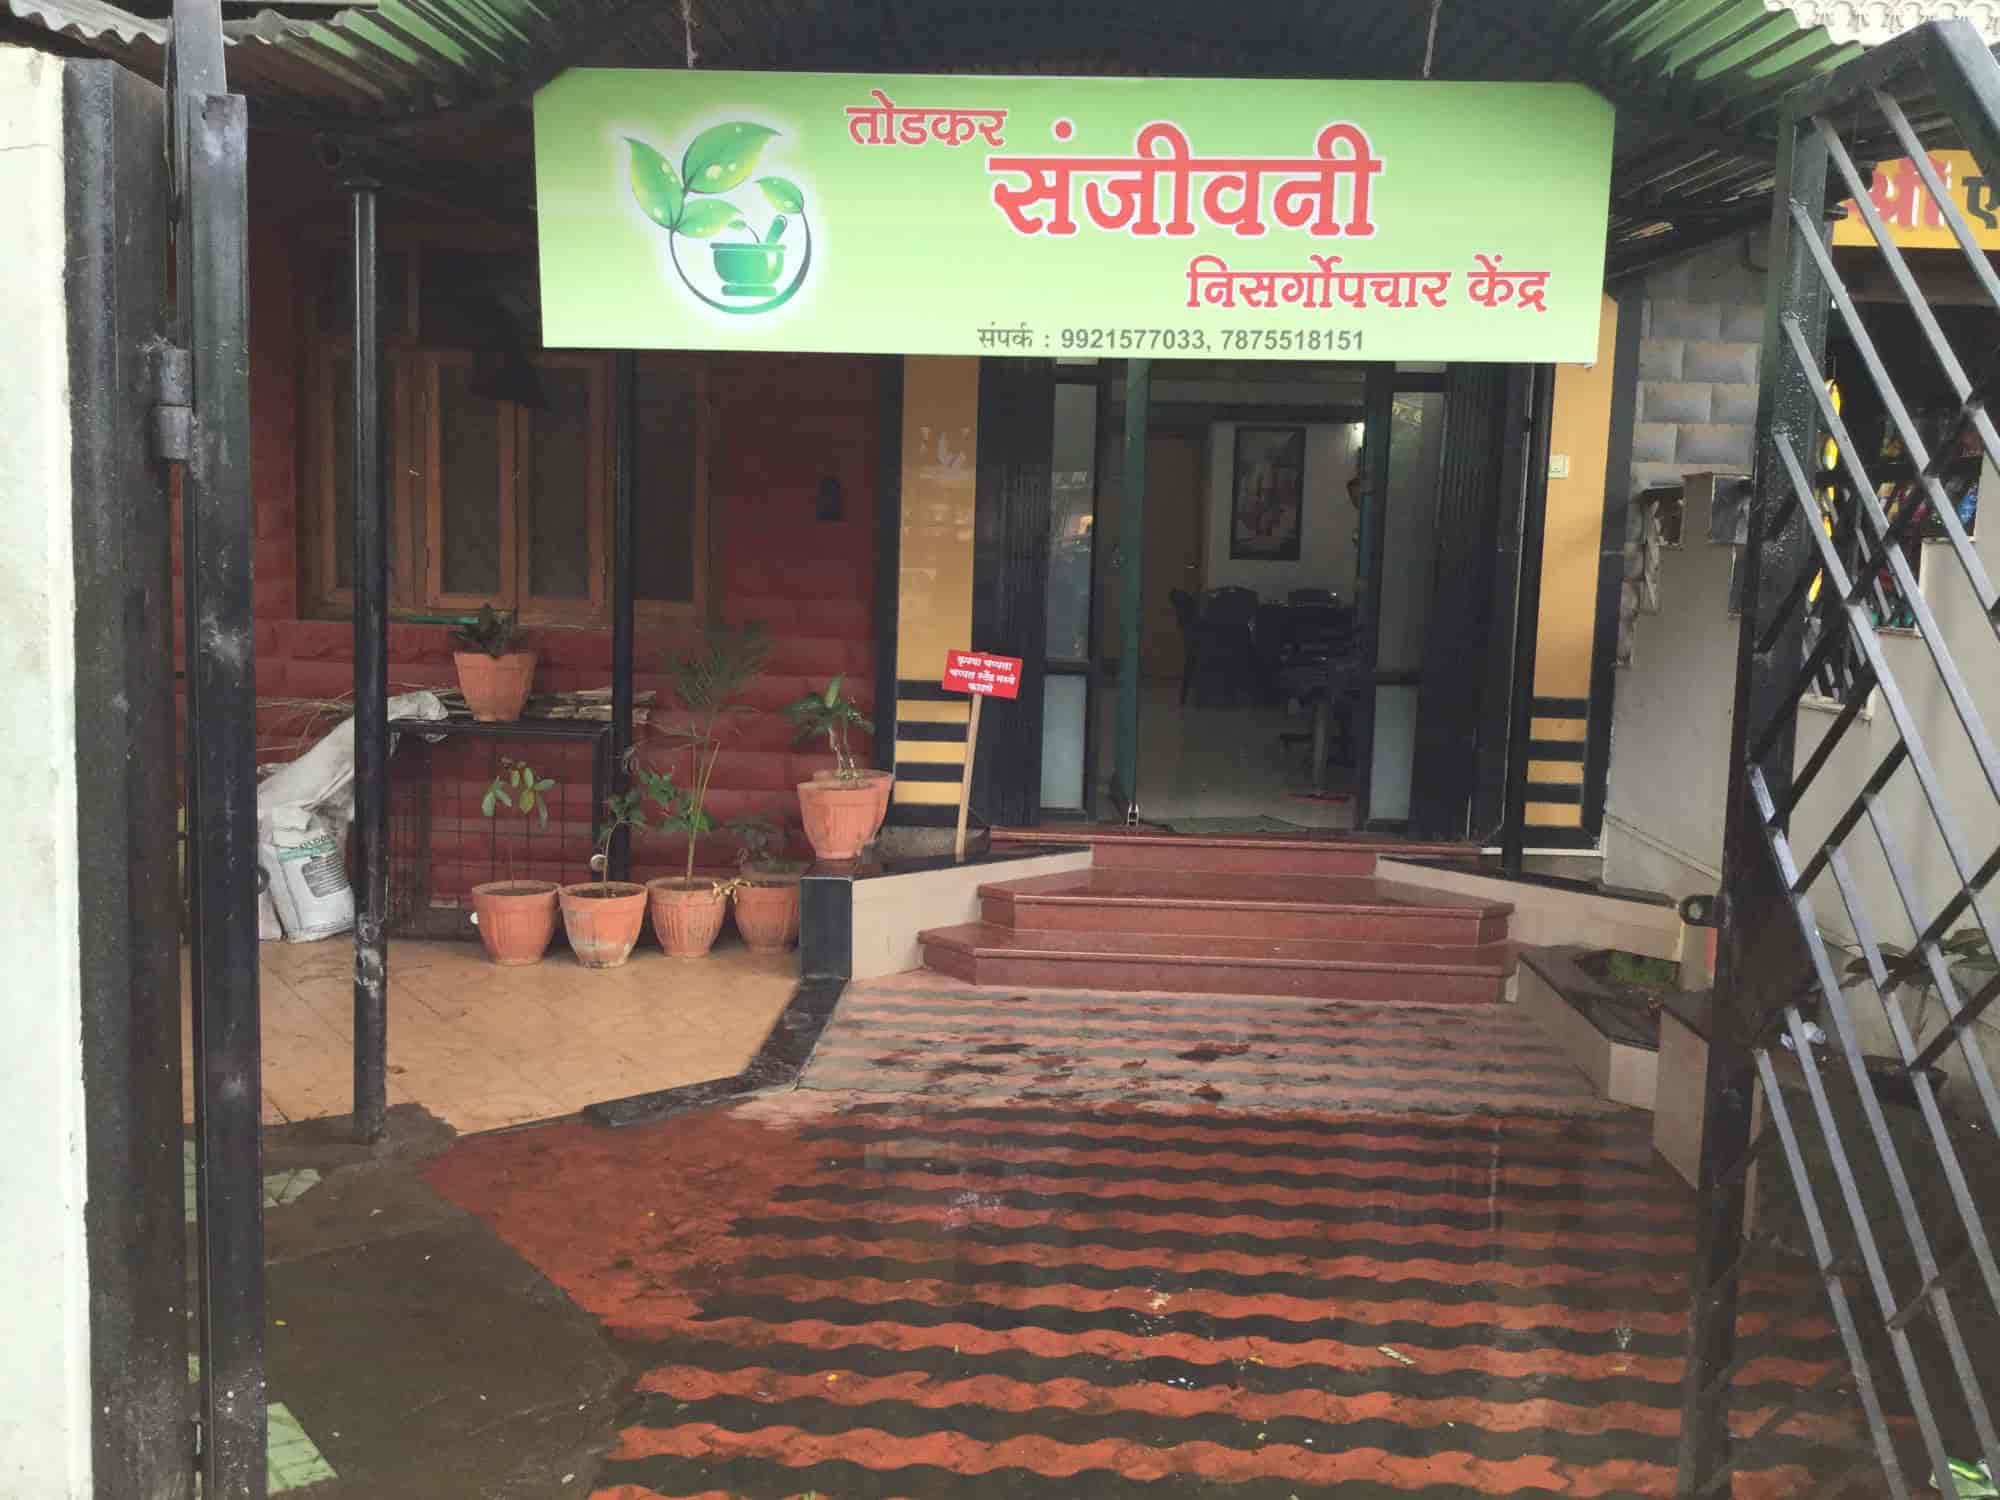 Top Ayurvedic Doctors For Kidney Treatment In Mangalwar Peth Kolhapur Best Ayurvedic Doctors For Kidney Failure Treatment Book Appointment Online Justdial